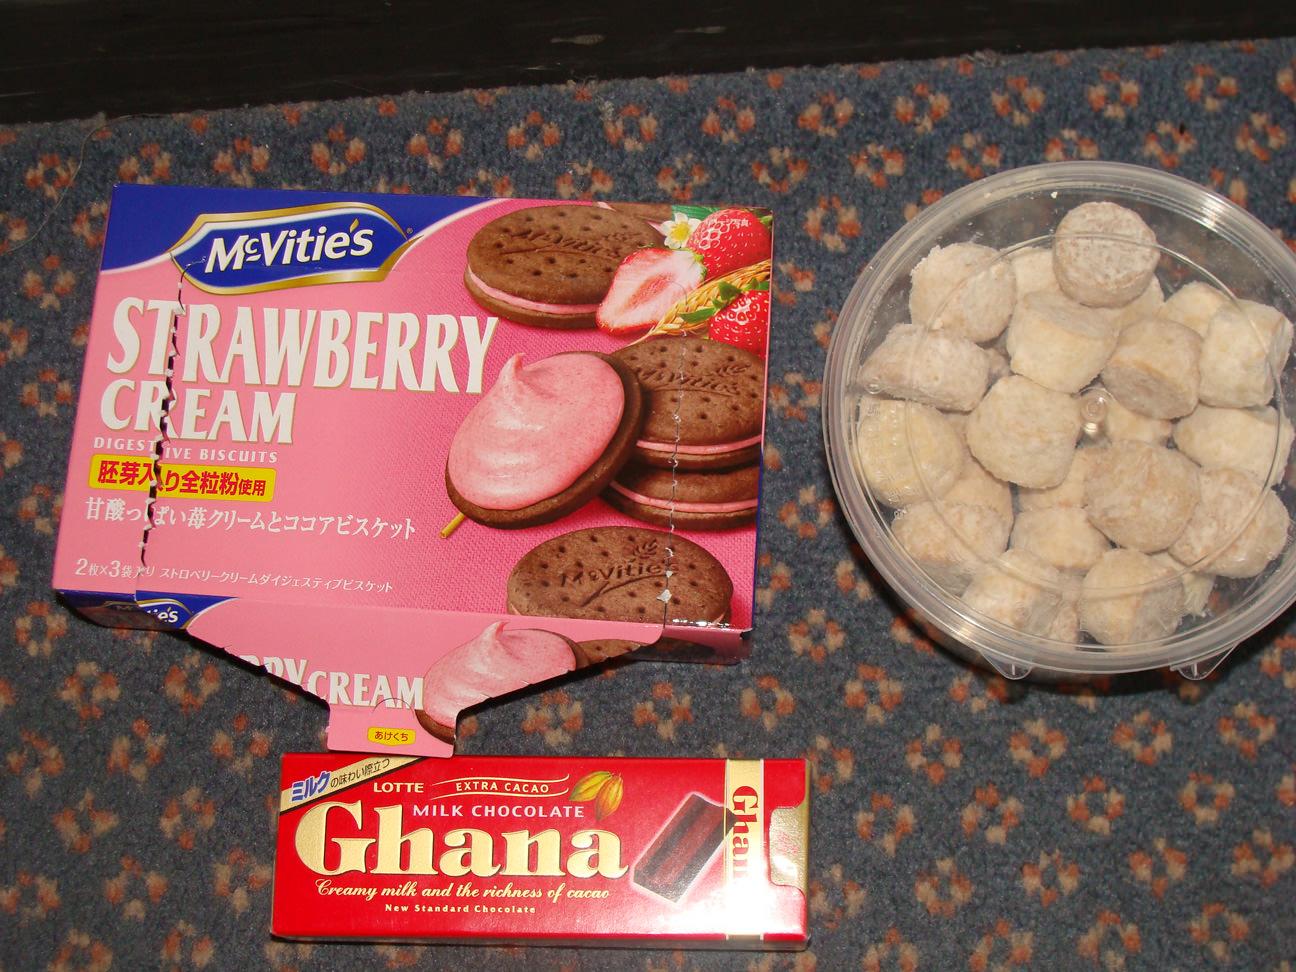 Some snacks I got at the Super Market and Shinagawa Station.